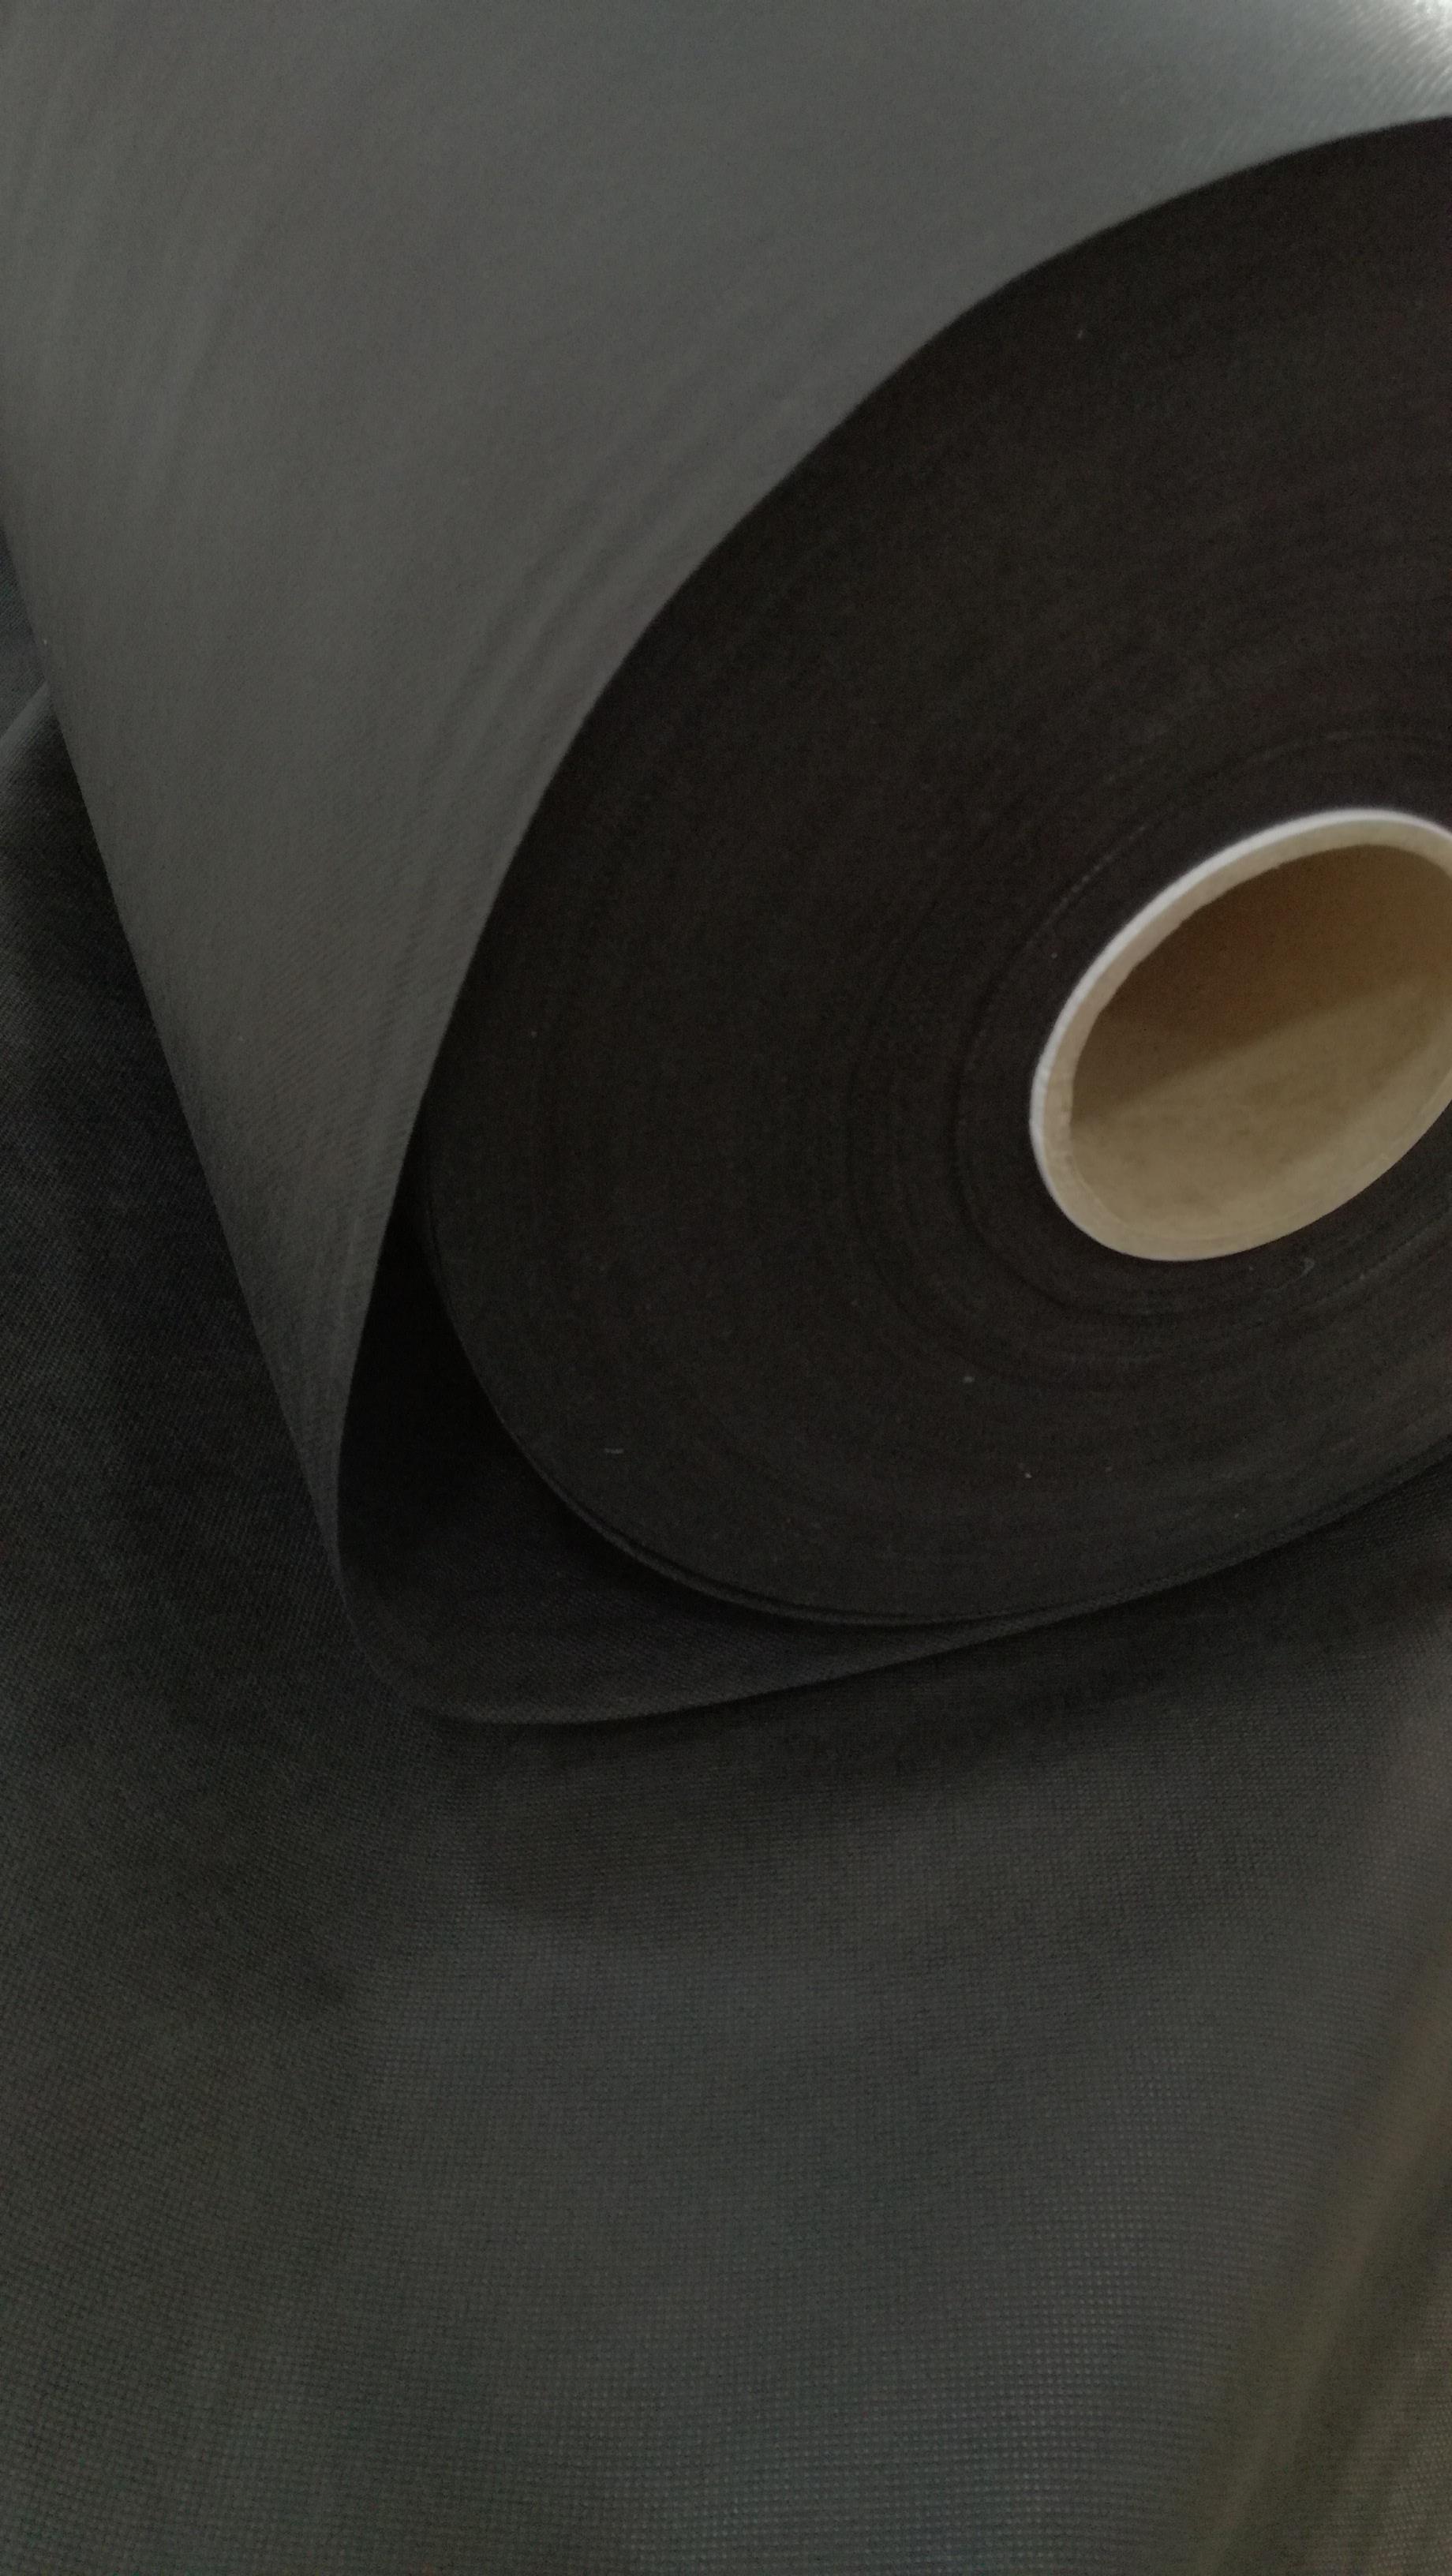 tejido tnt hidrofugo negro